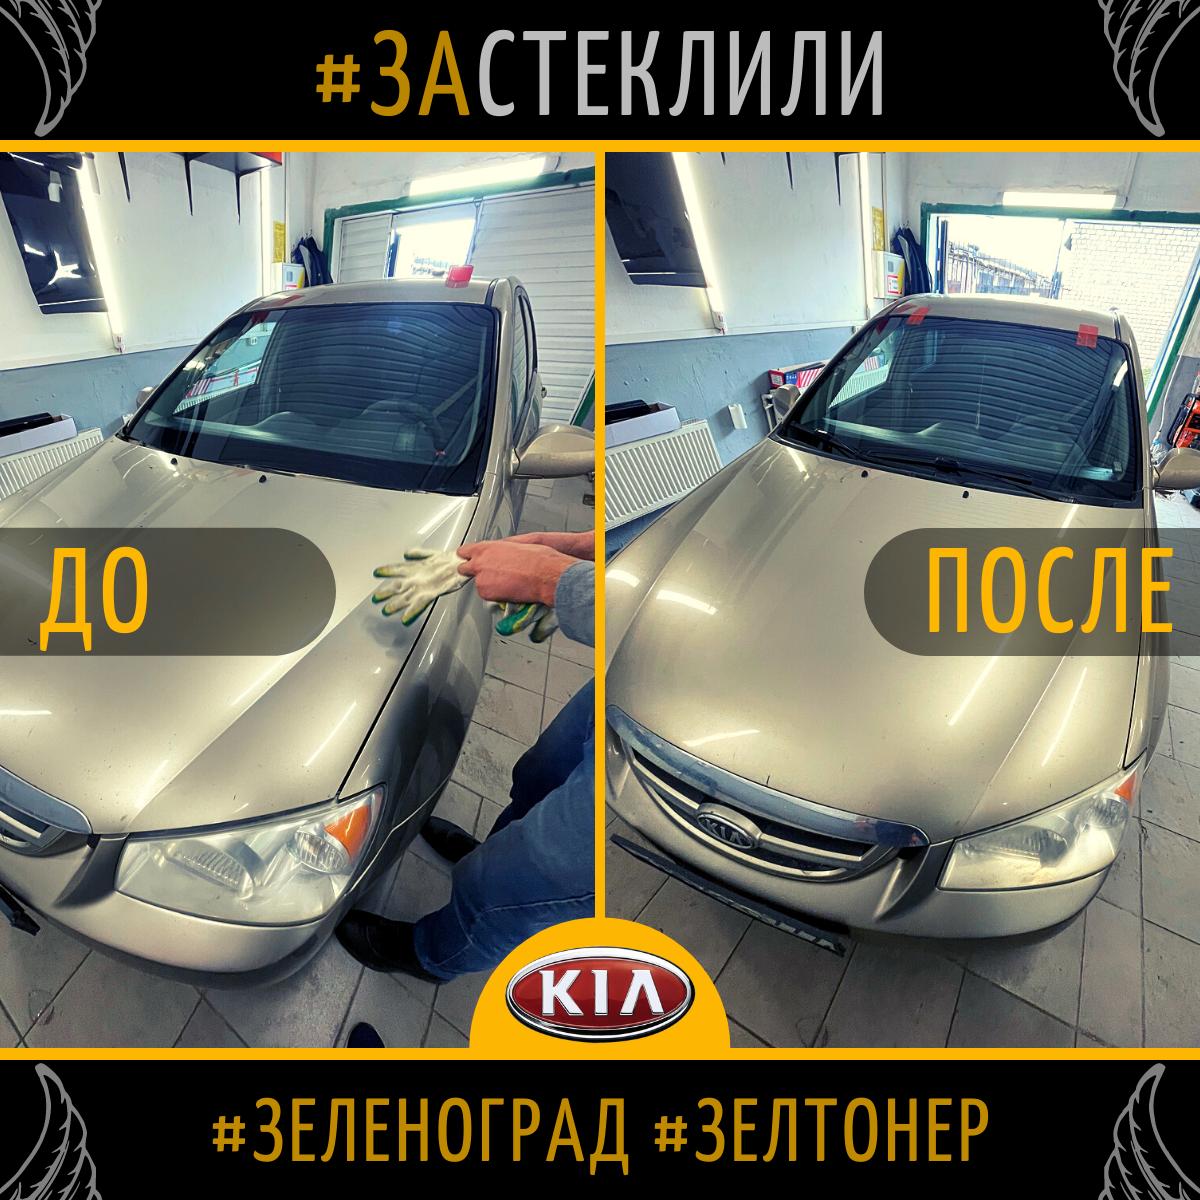 Замена автостекла КИА Рио - лобовое стекло (фото до и после) ✌😎